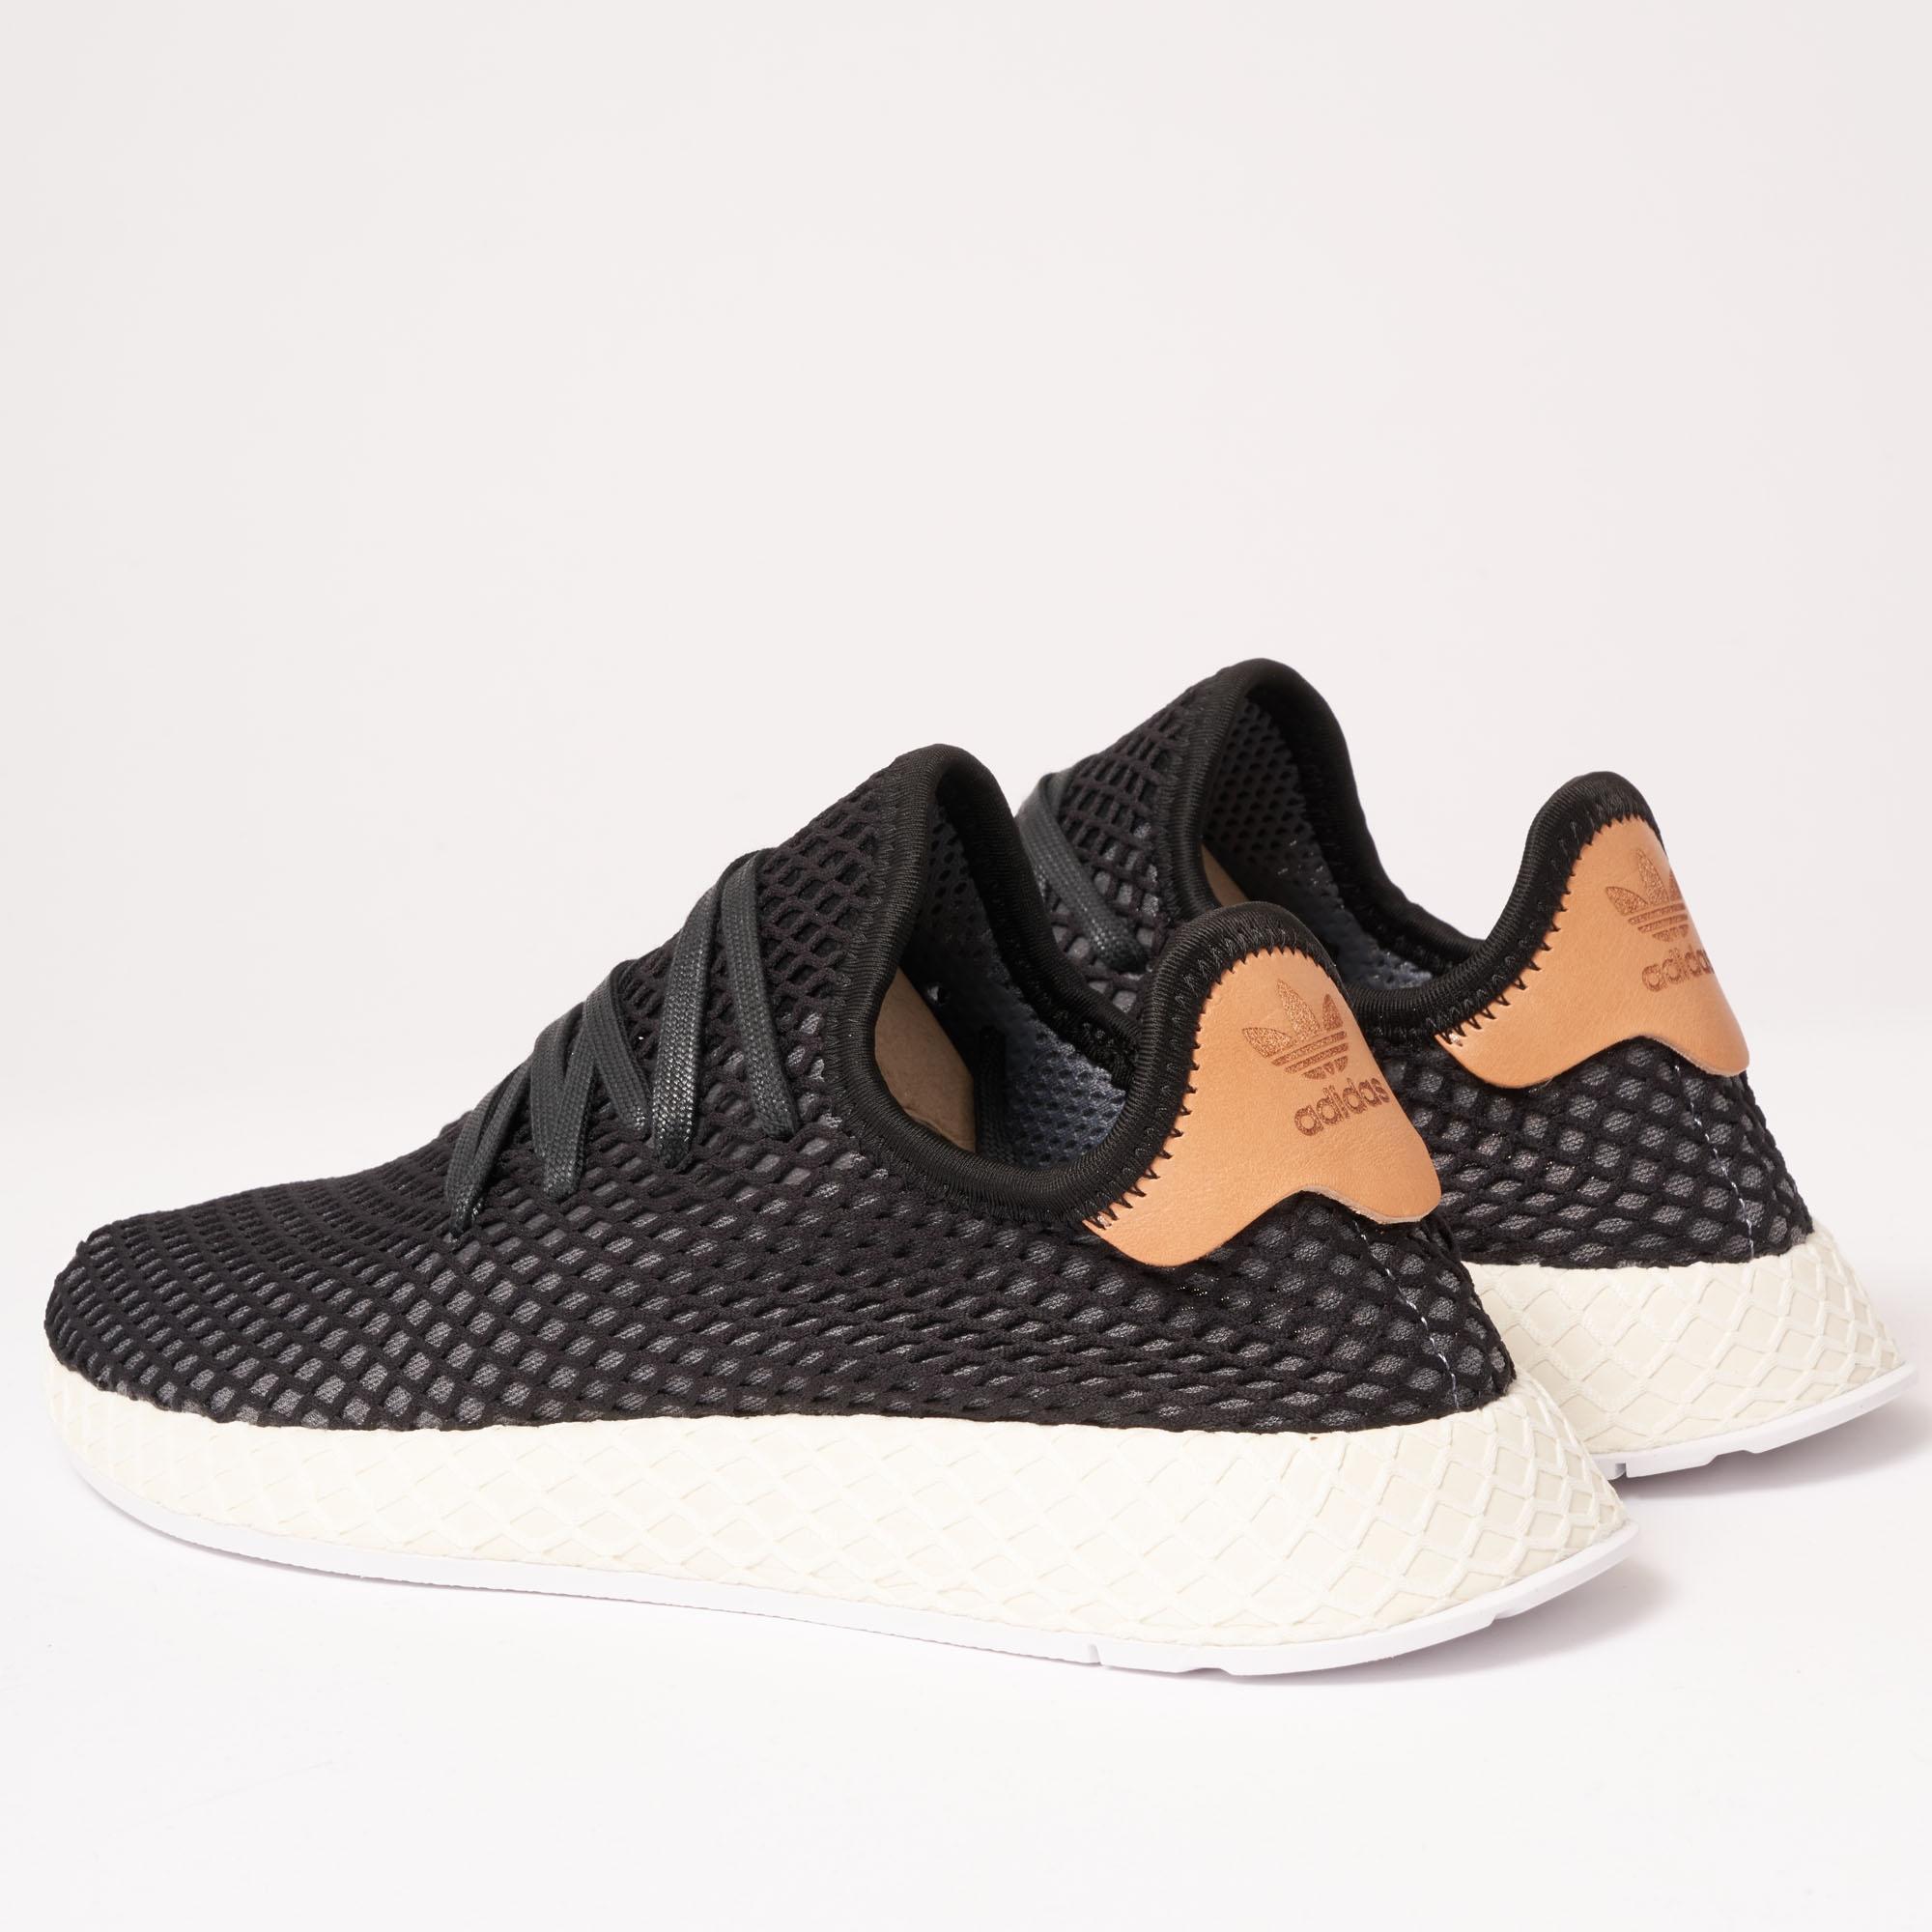 size 40 244eb 6bf4d adidas Originals Deerupt Runner - Core Black   Ash Pearl in Black ...